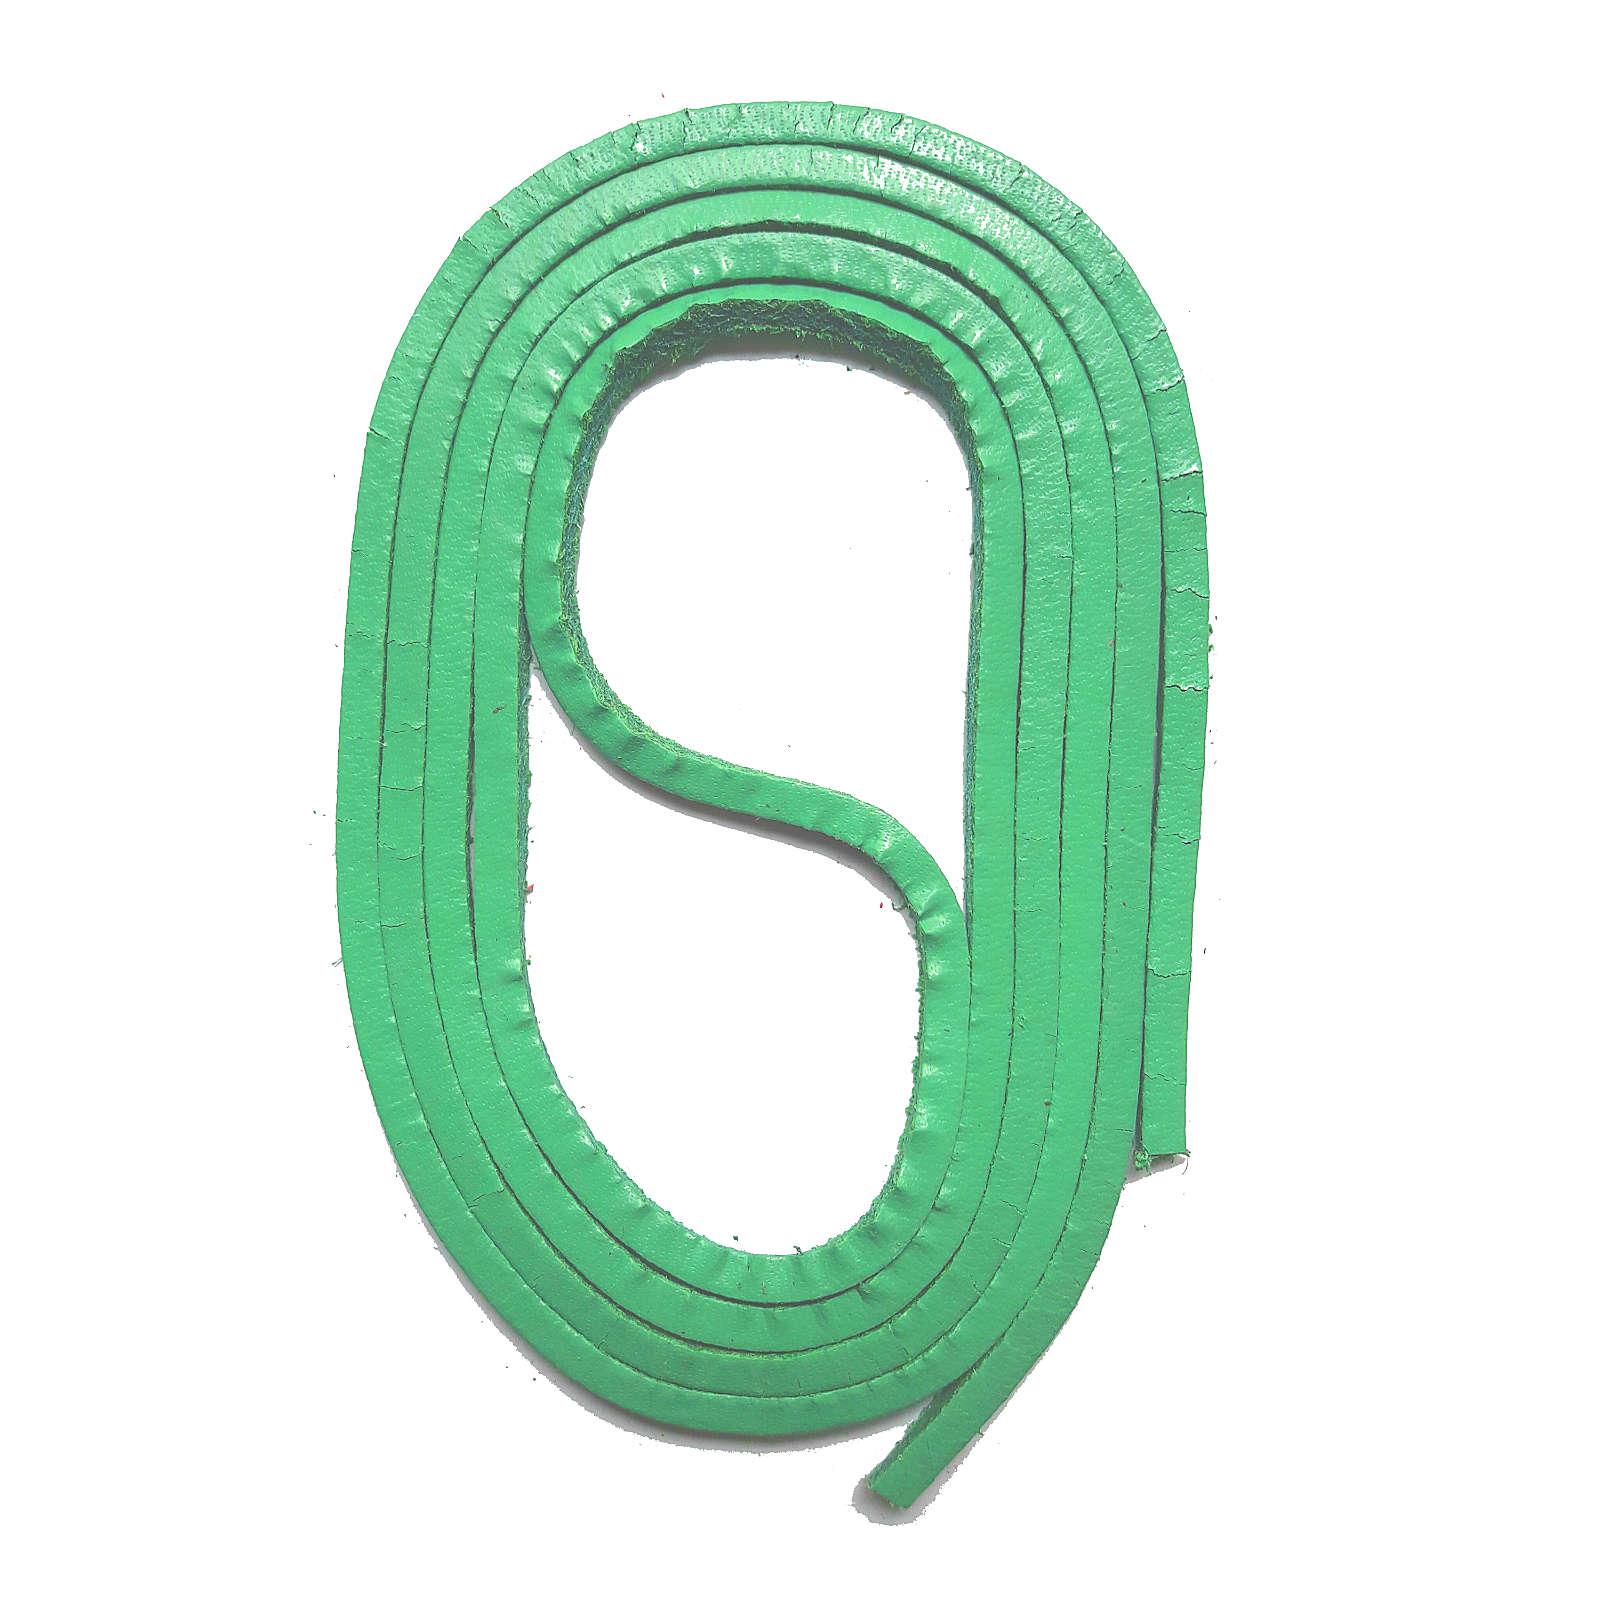 SNORS shoefriends SNORS Schnürsenkel Leder 120cm, 3mm aus echtem Rindsleder Schnürsenkel grün Gr. 120